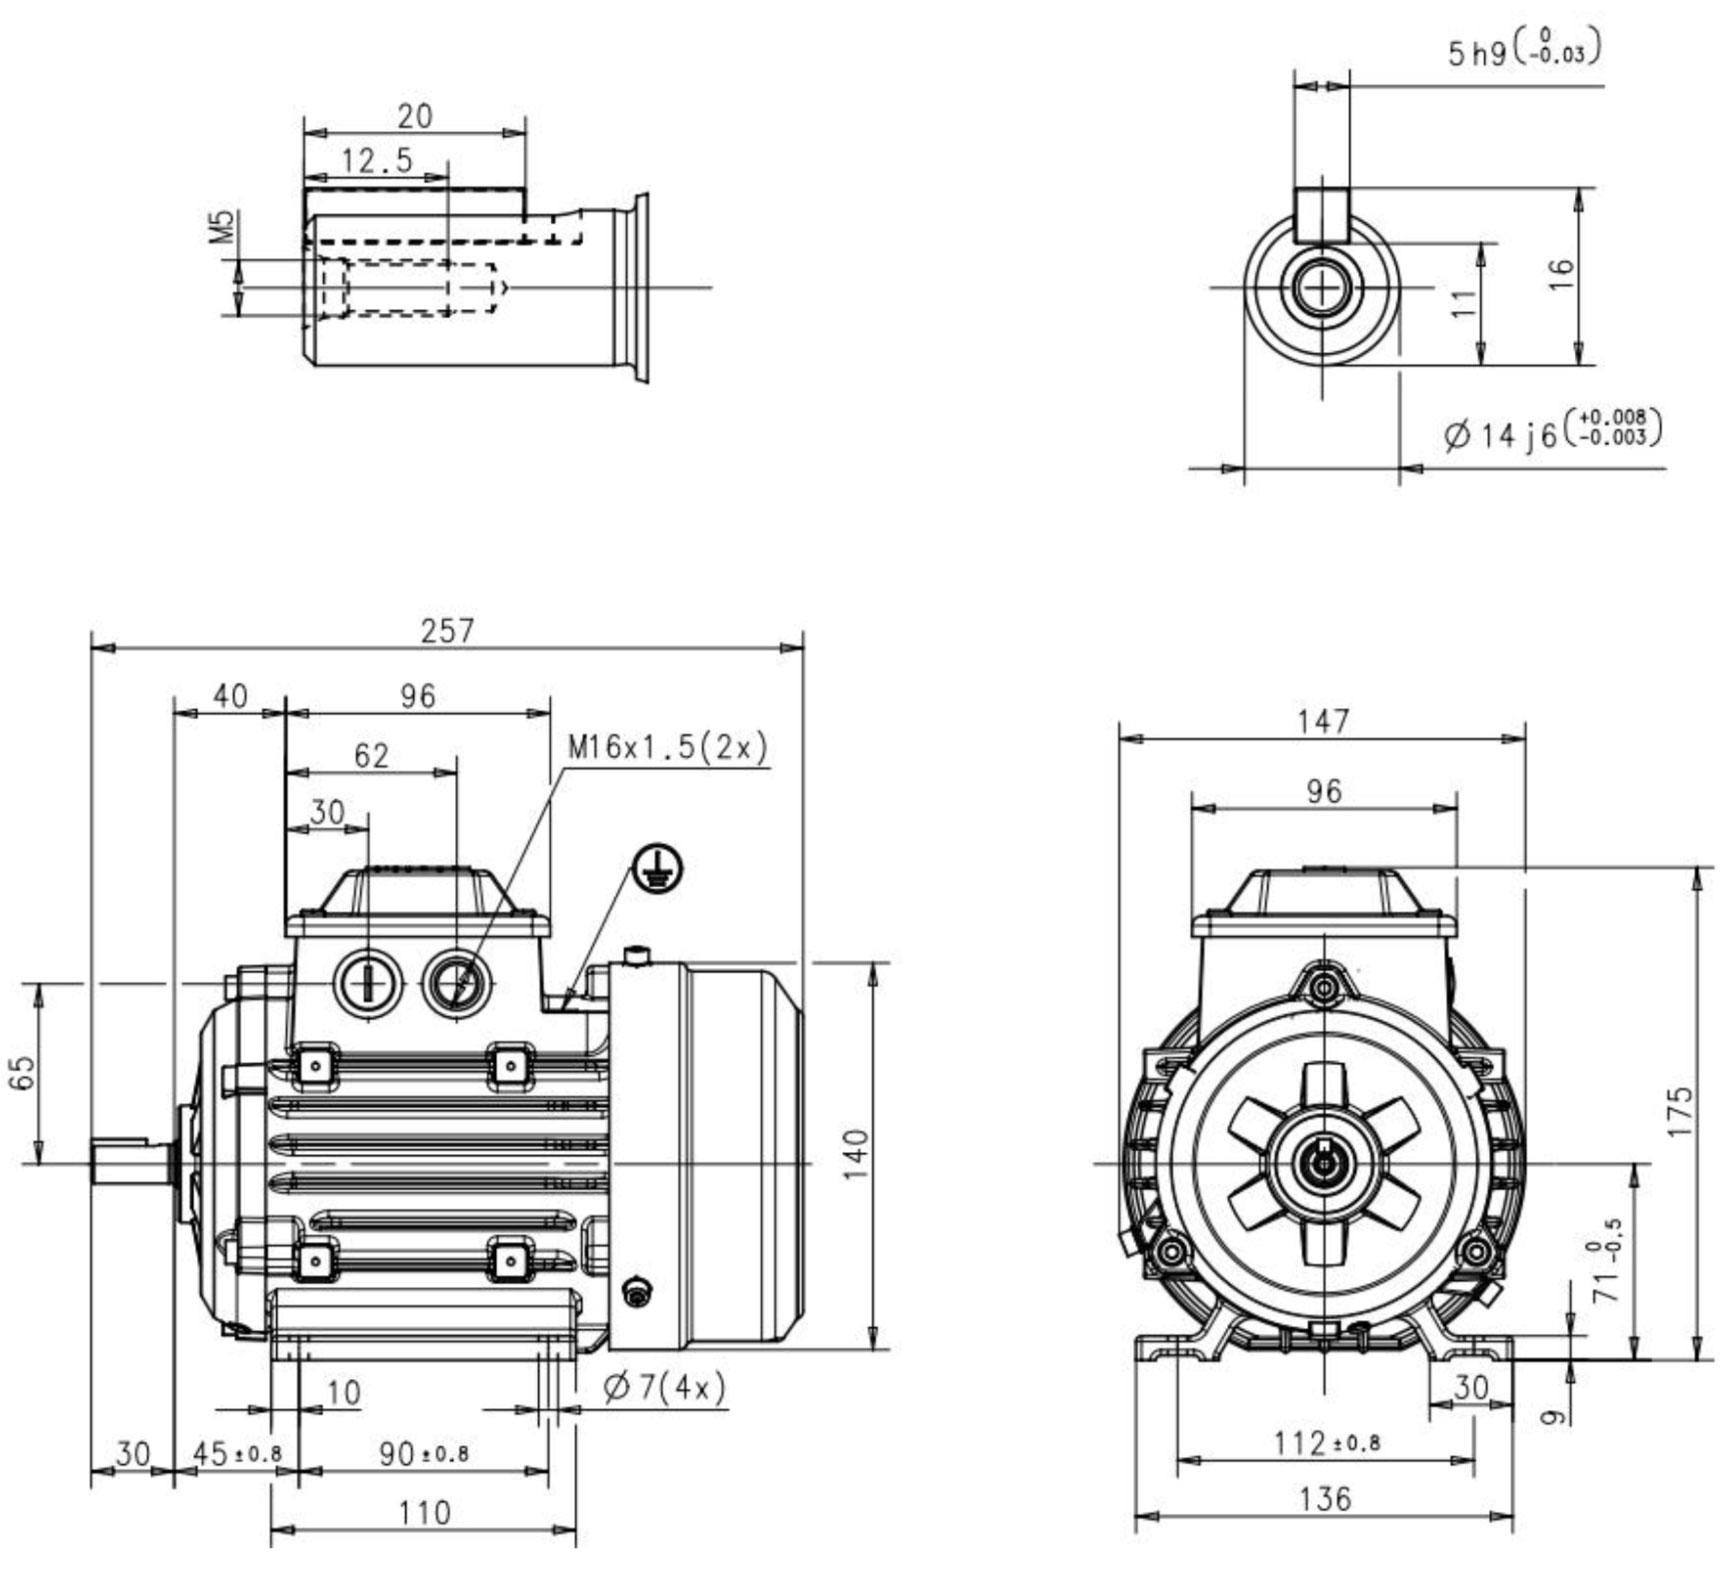 moteur triphas u00e9 0 25 kw  1500 tr  min  b3  230  400v - abb